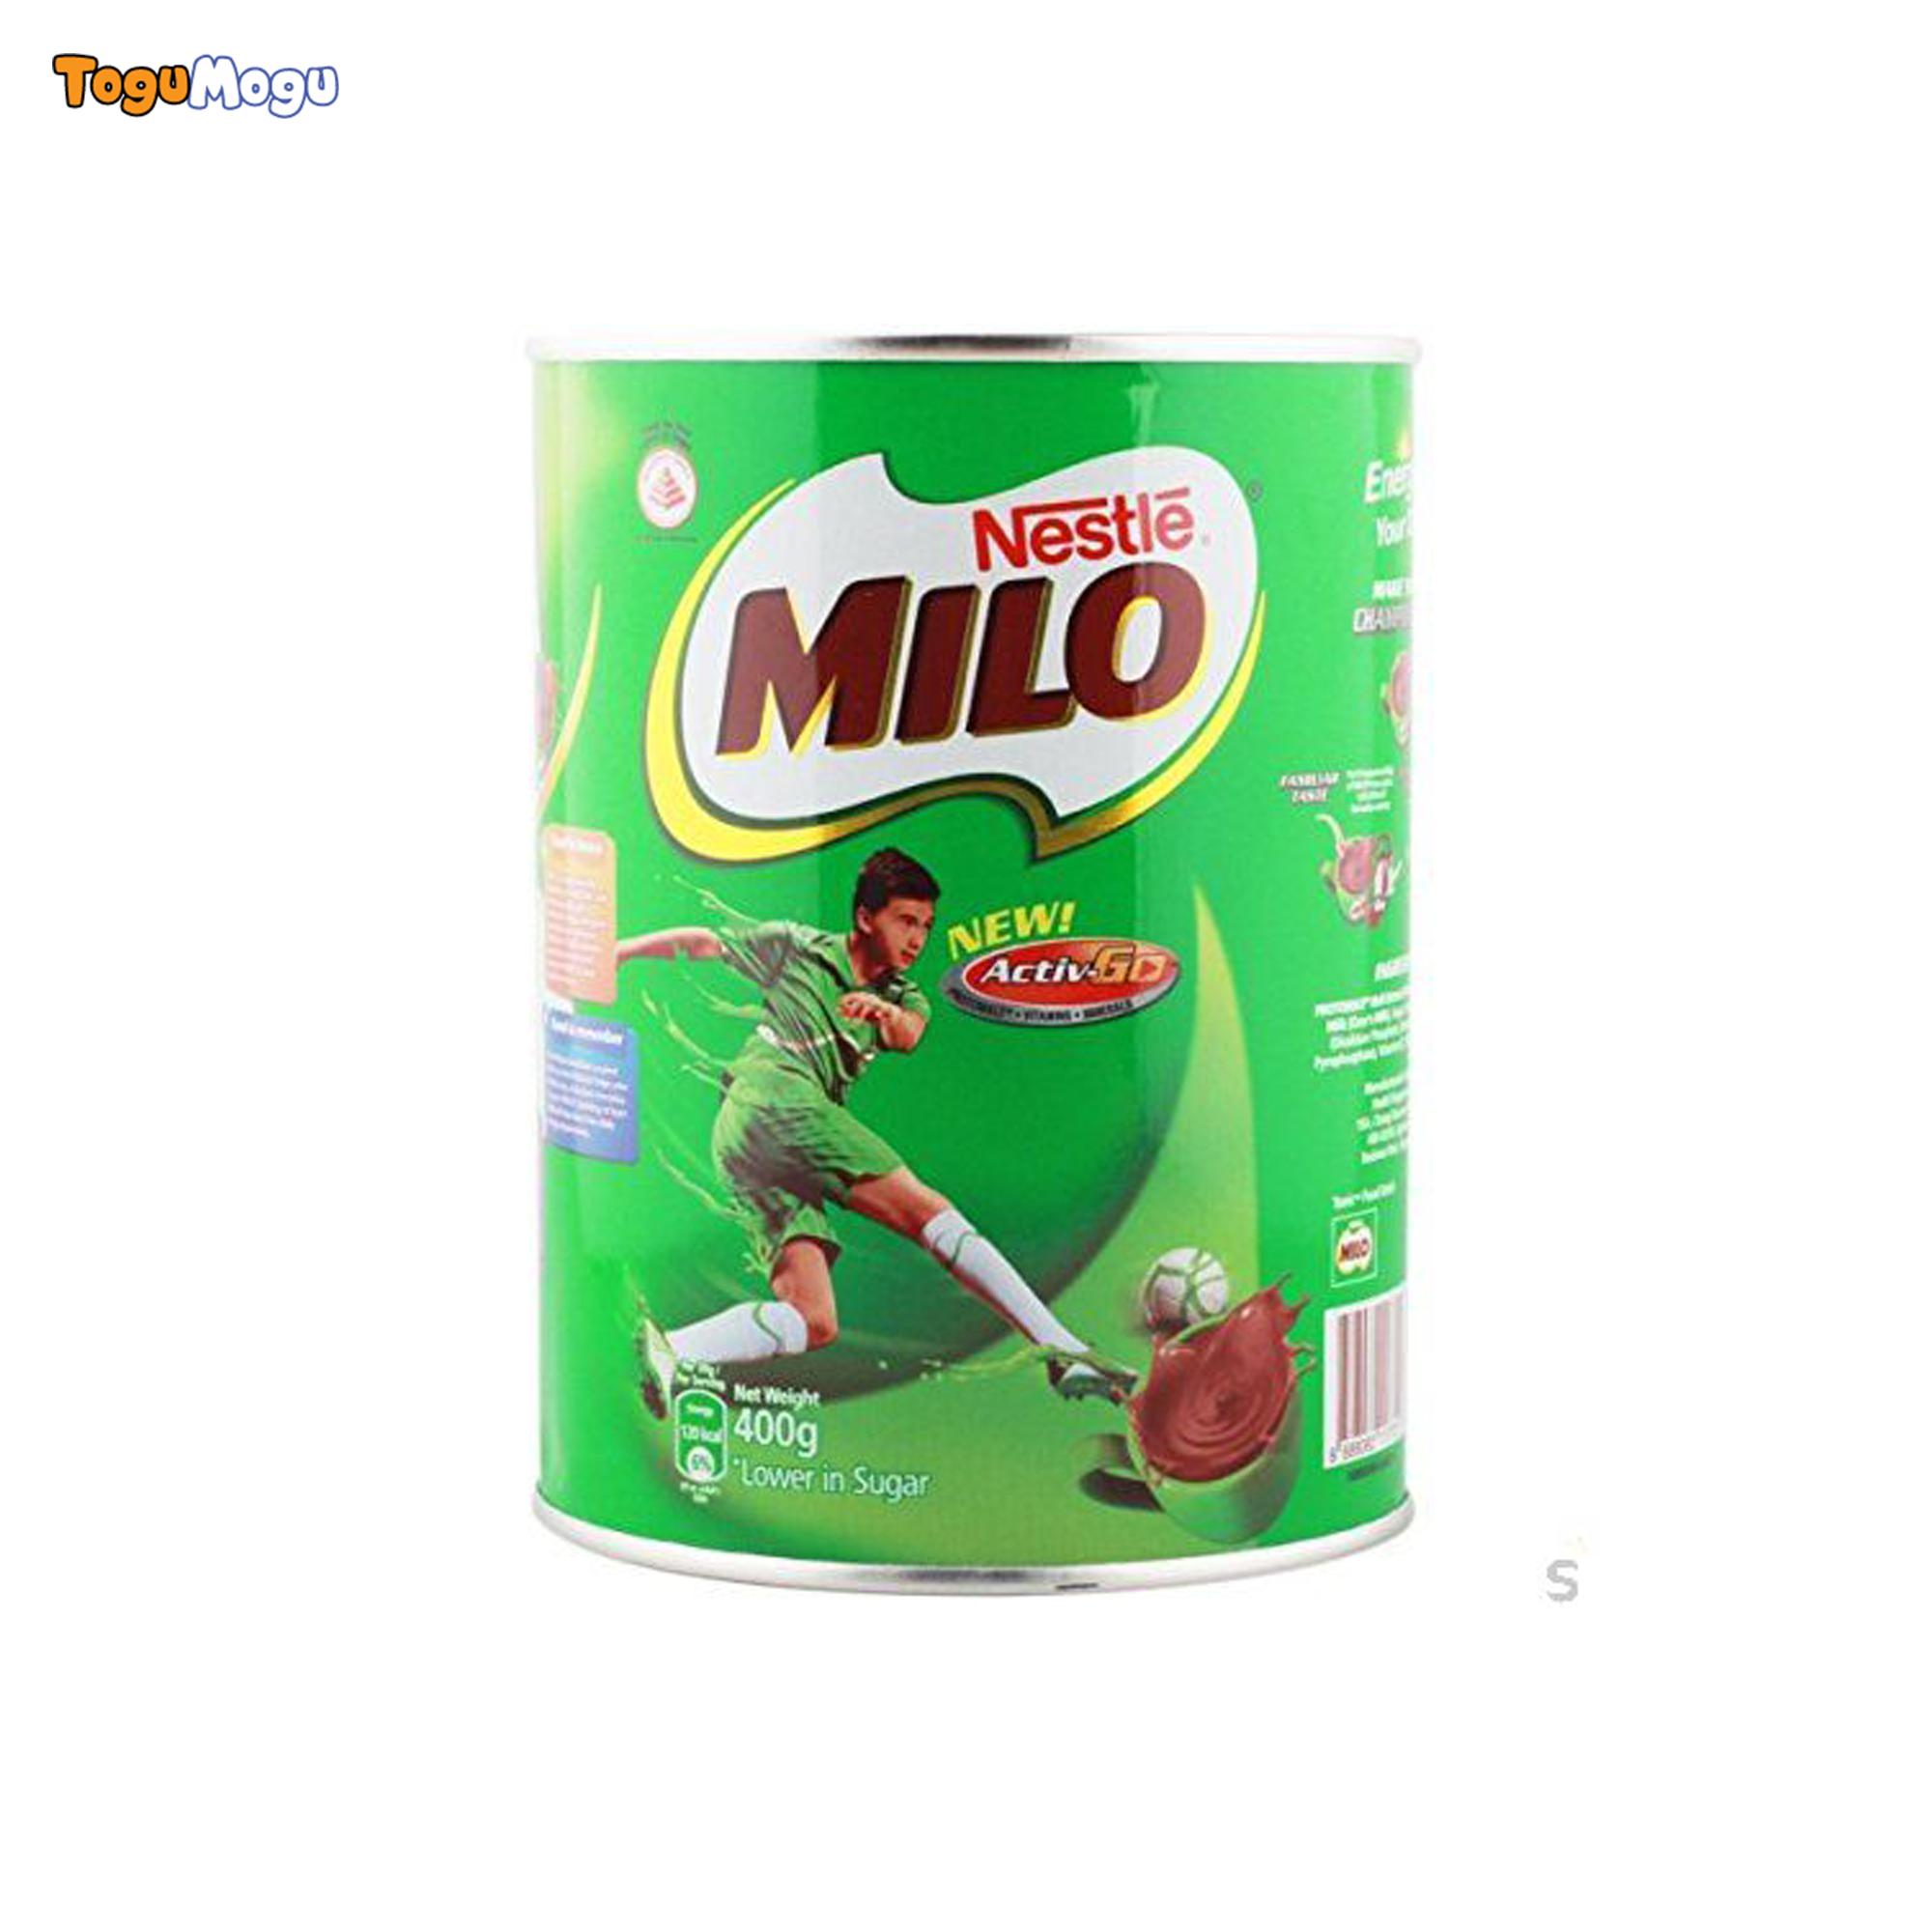 MILO ACTIV-GO 24x400g Tin